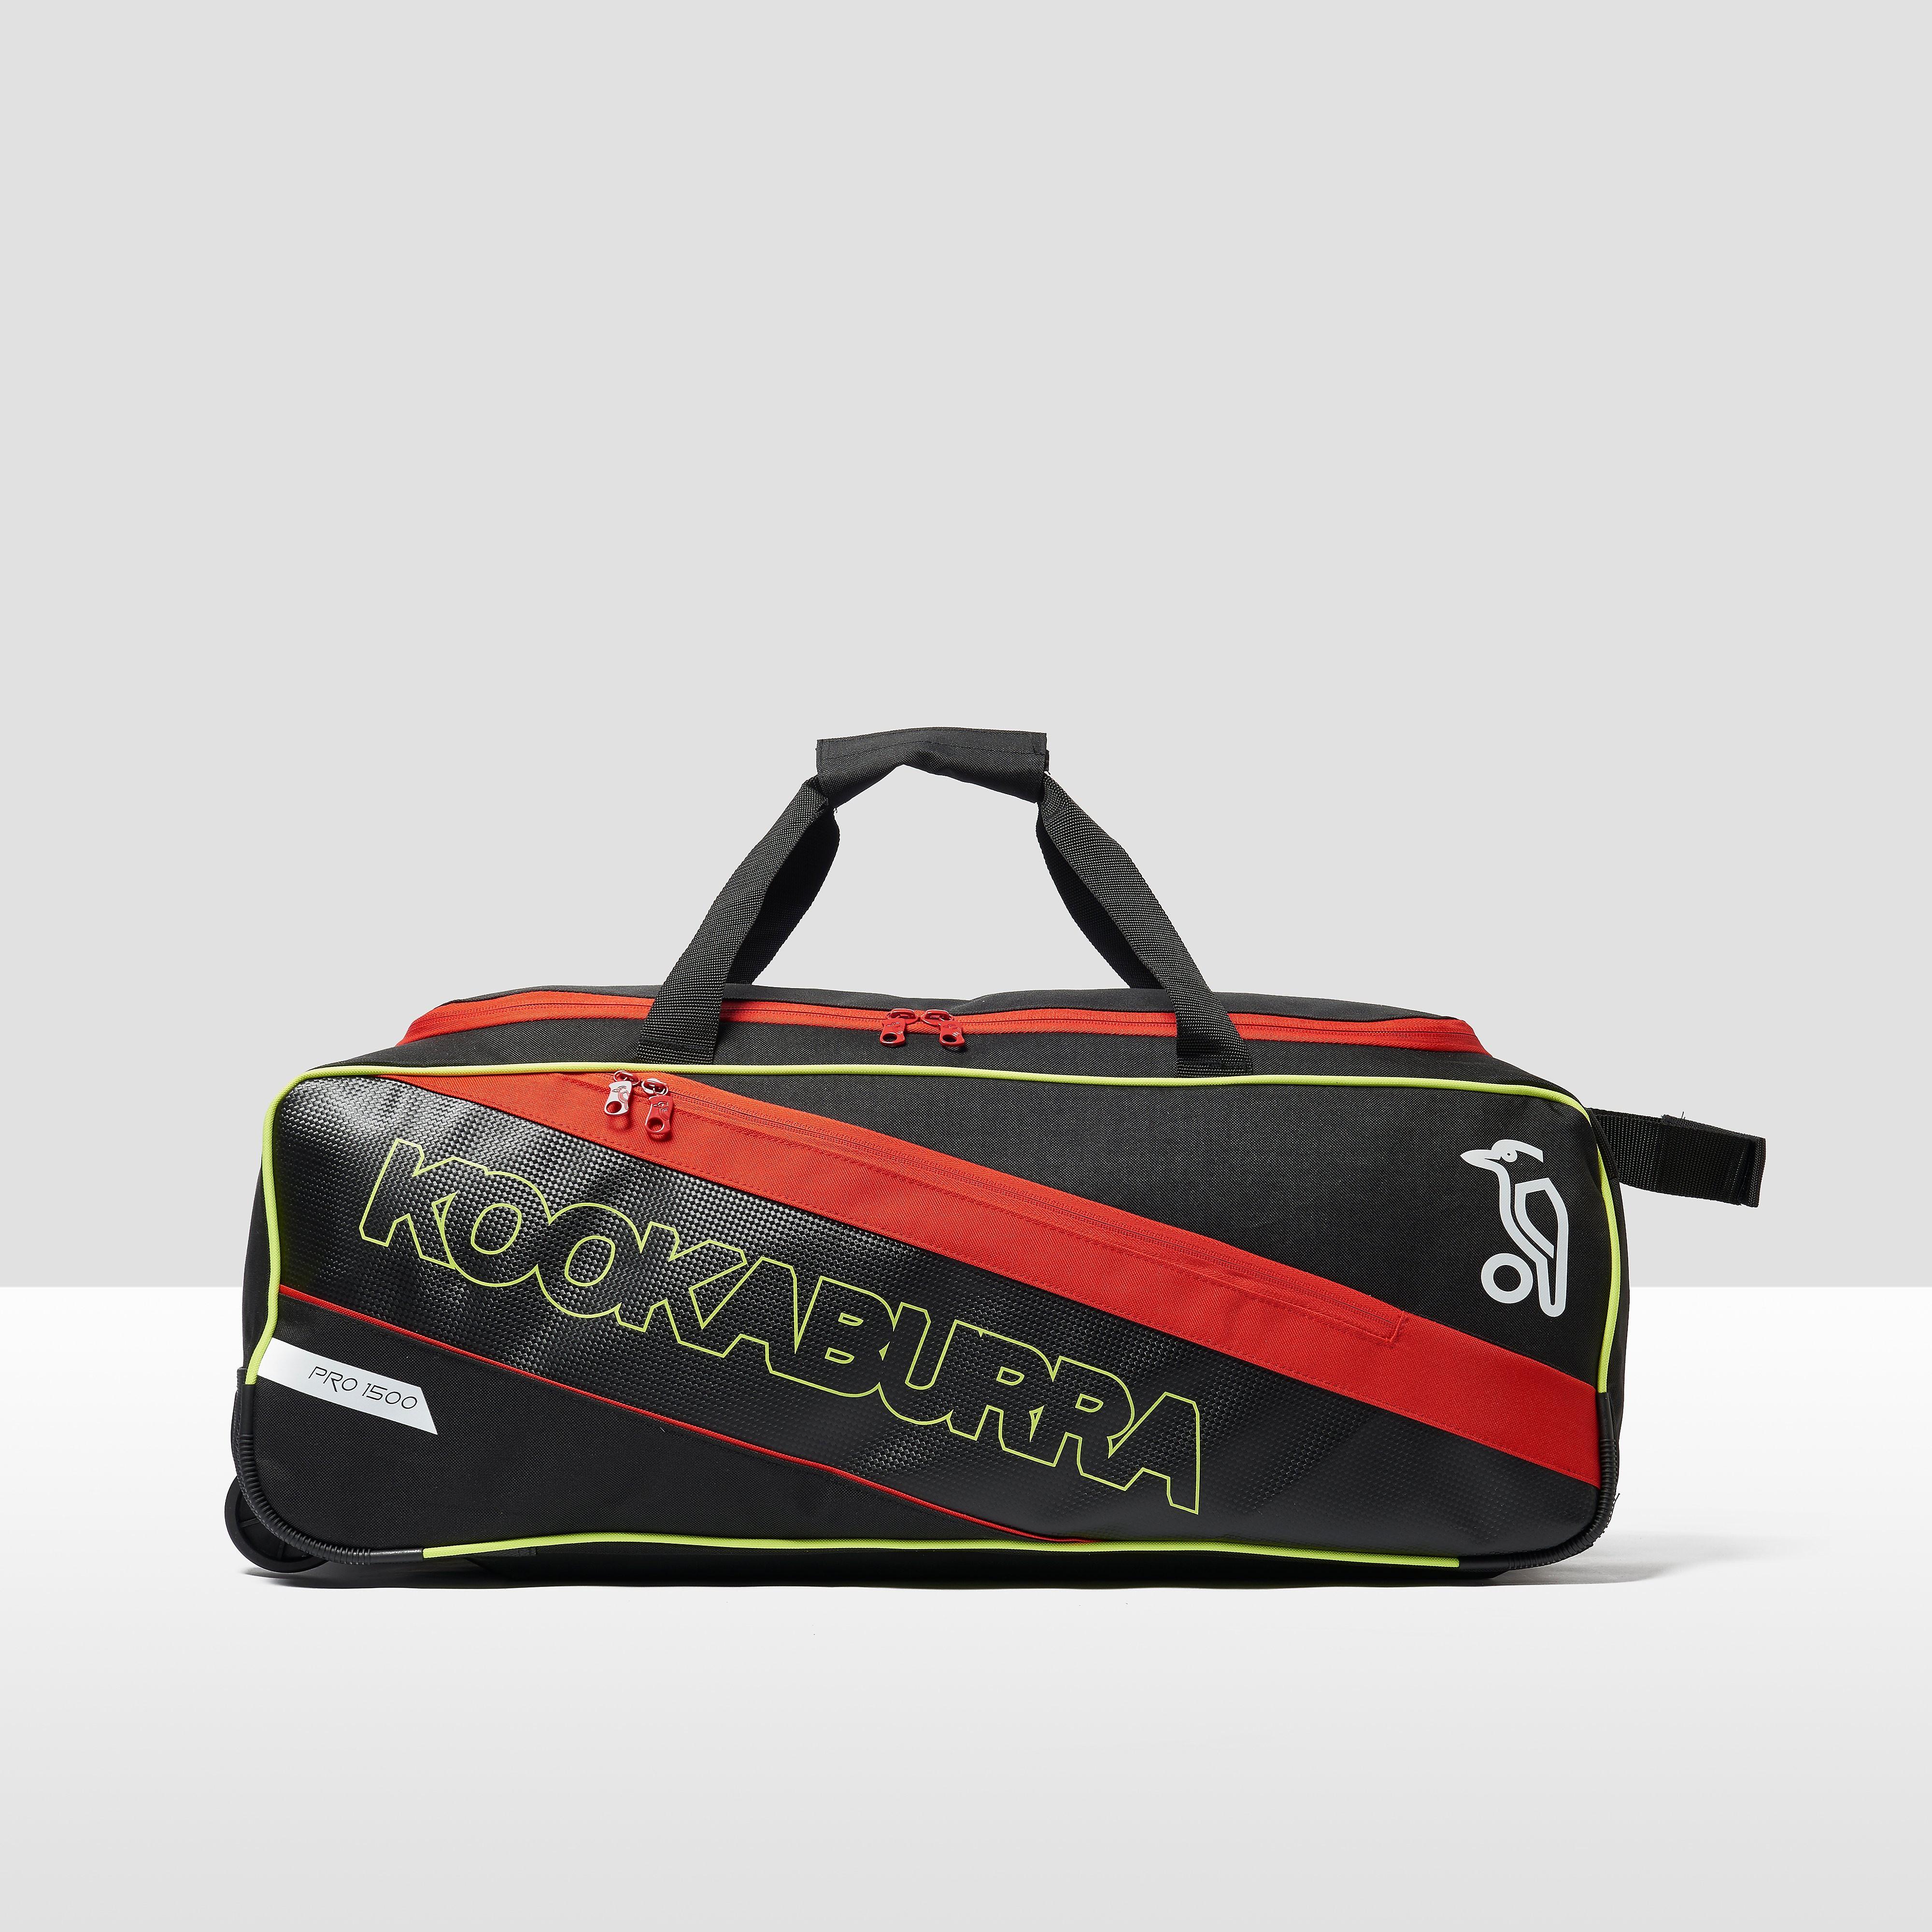 Kookaburra Pro Wheelie Bag